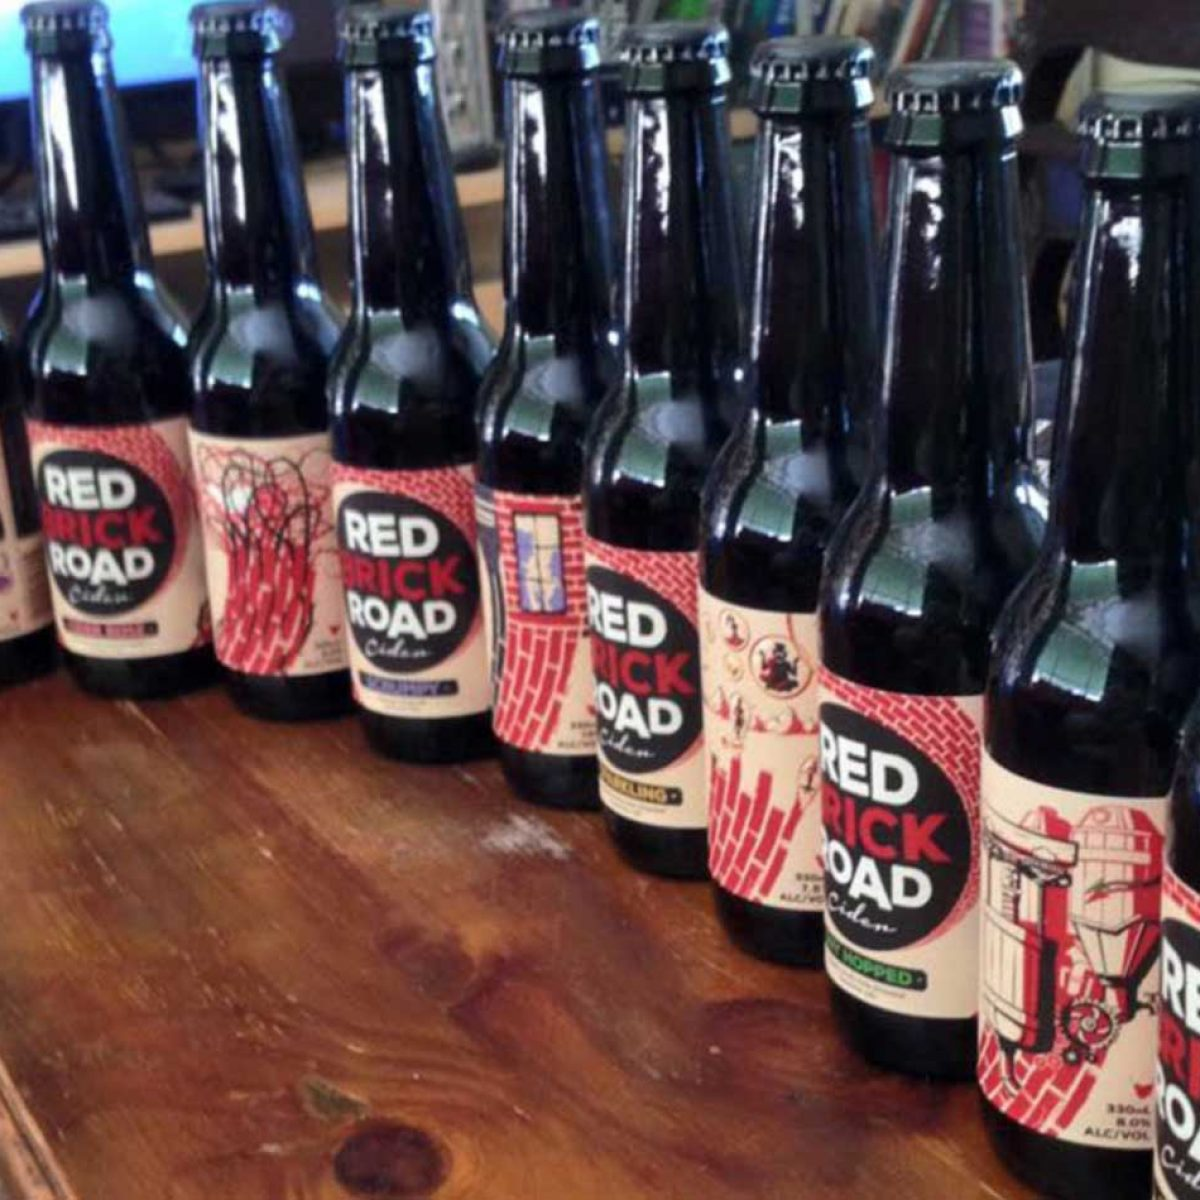 Red Brick Road Cider Brand Identity